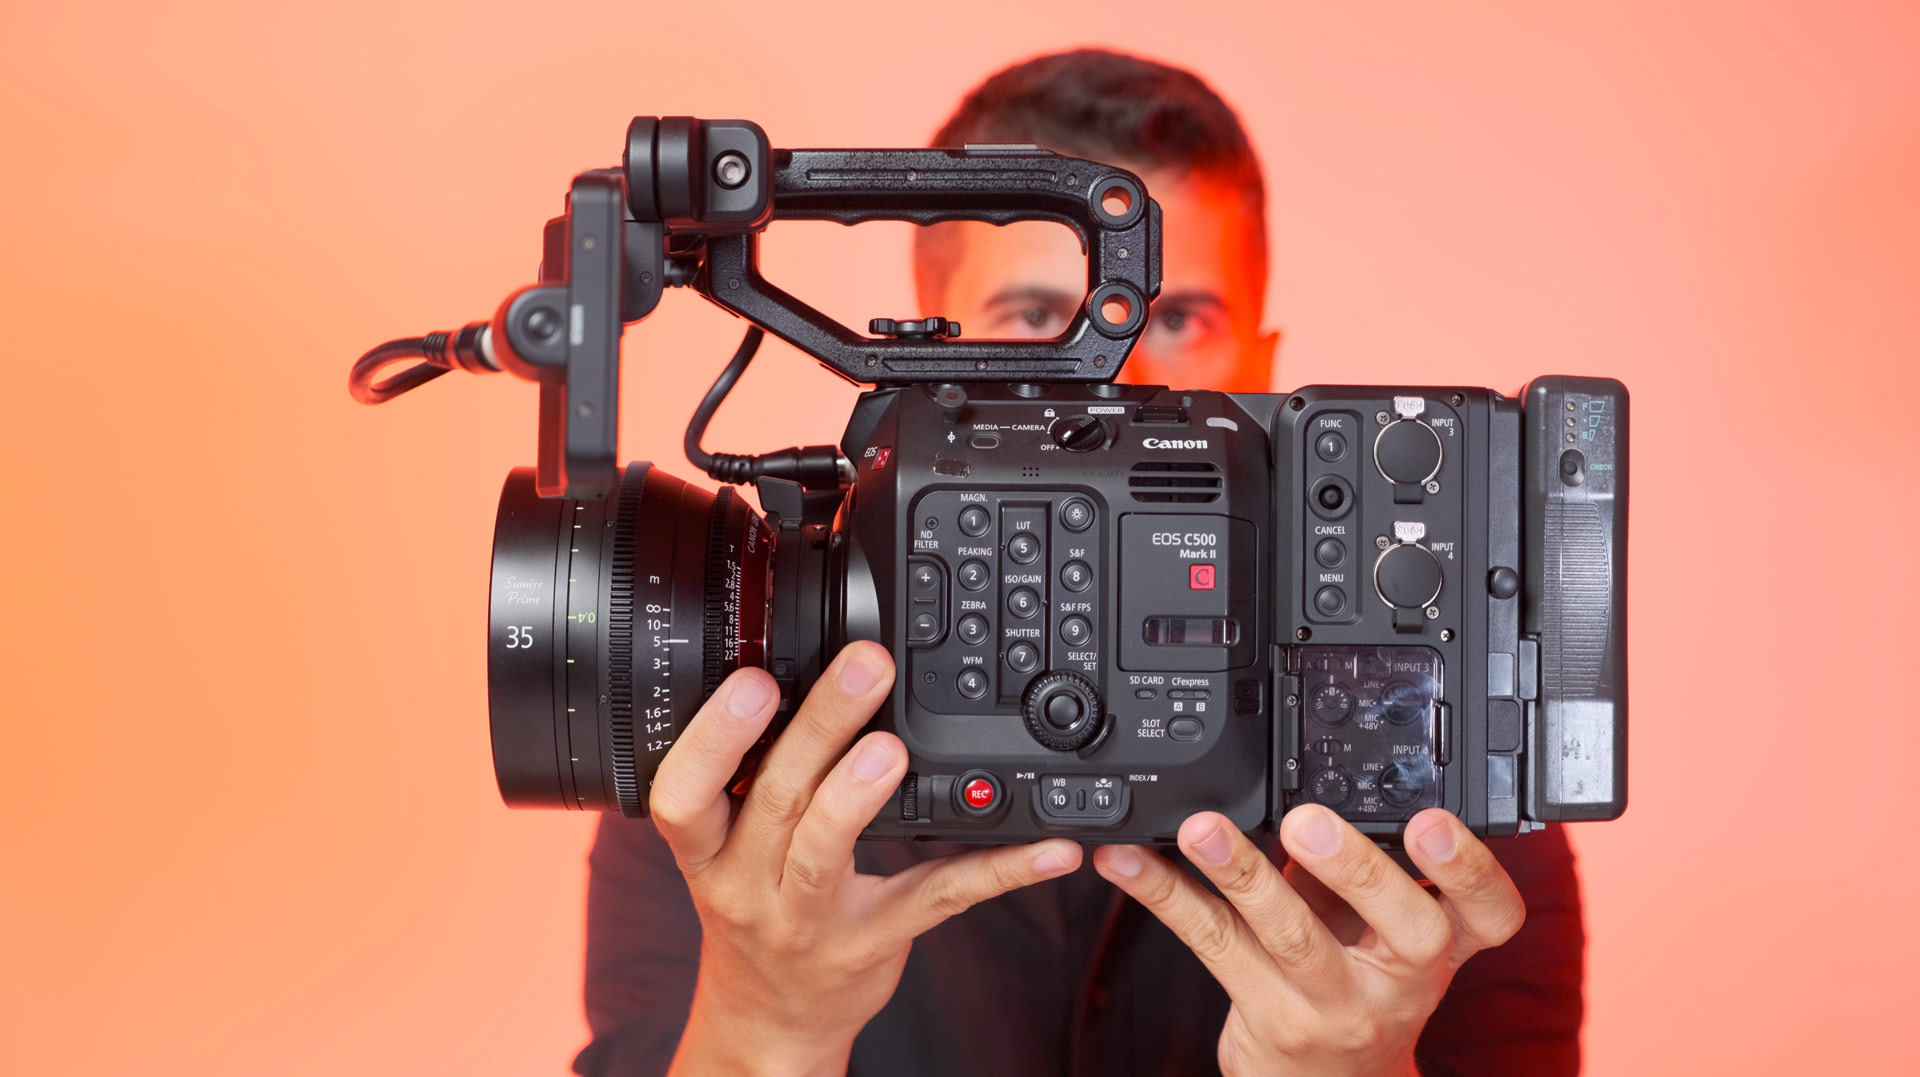 https://www.cinema5d.com/wp-content/uploads/2019/09/c500-mark-ii-extension-unit-2-hands.jpg